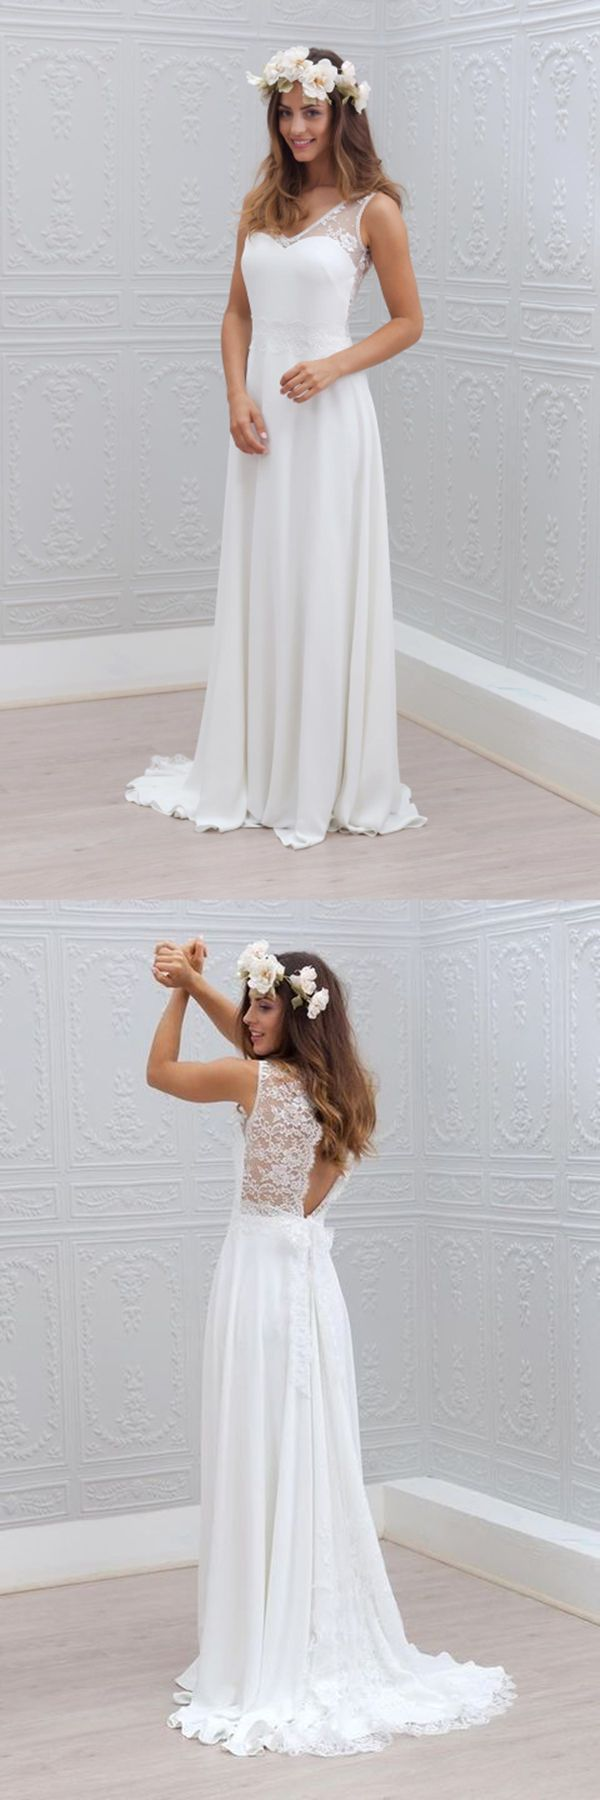 Simple white wedding dressesbeach wedding dressopen back long